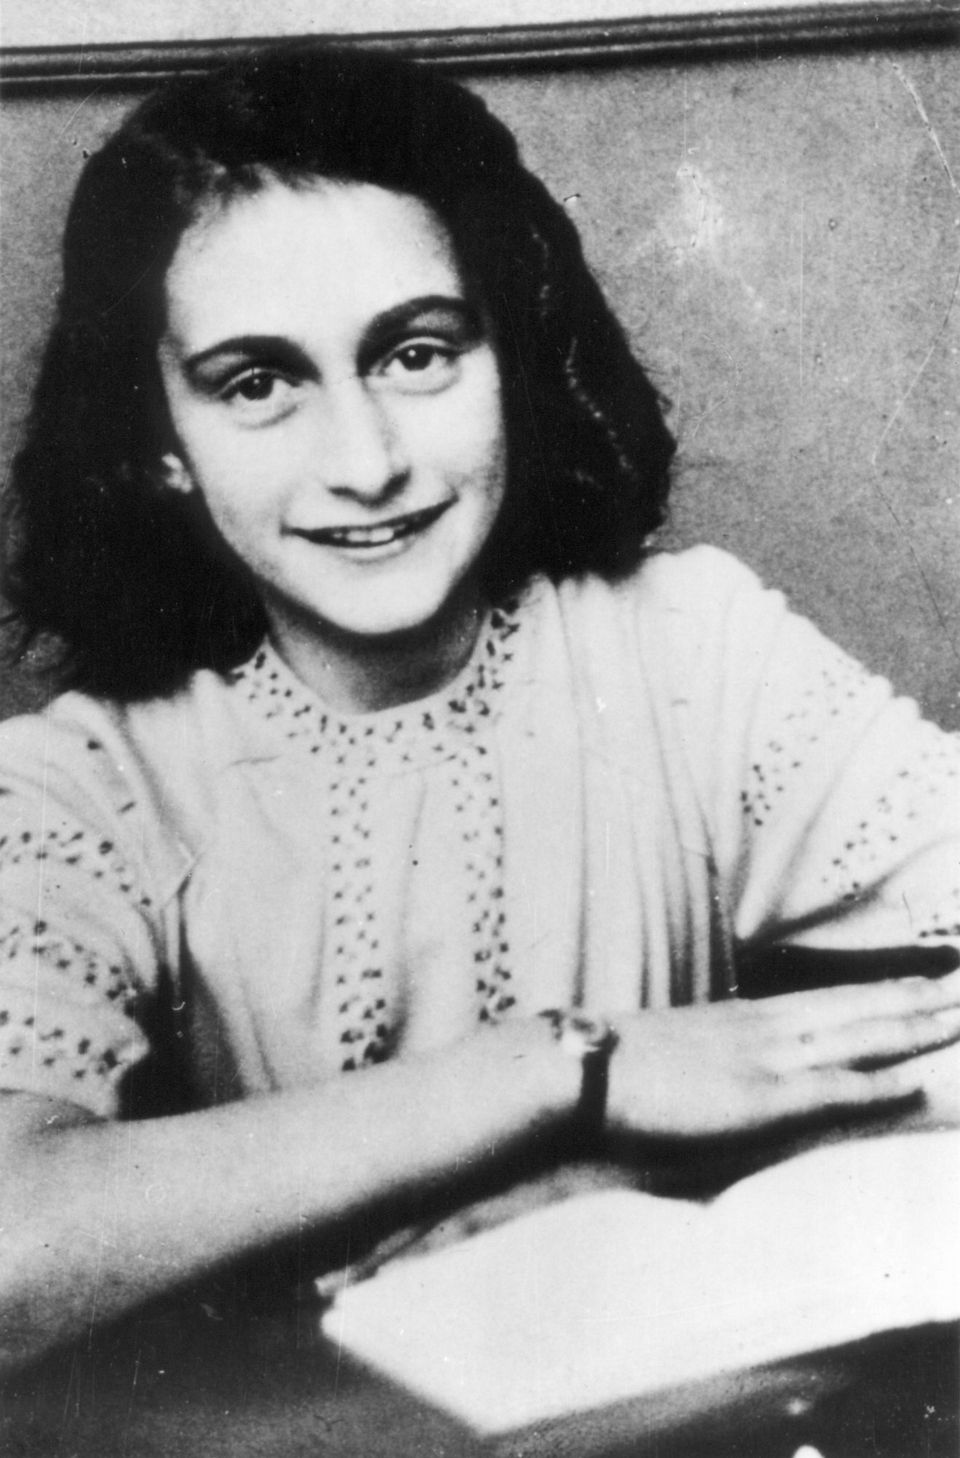 Citaten Uit Dagboek Anne Frank : Home famous faces in history anne frank house anne frank anna